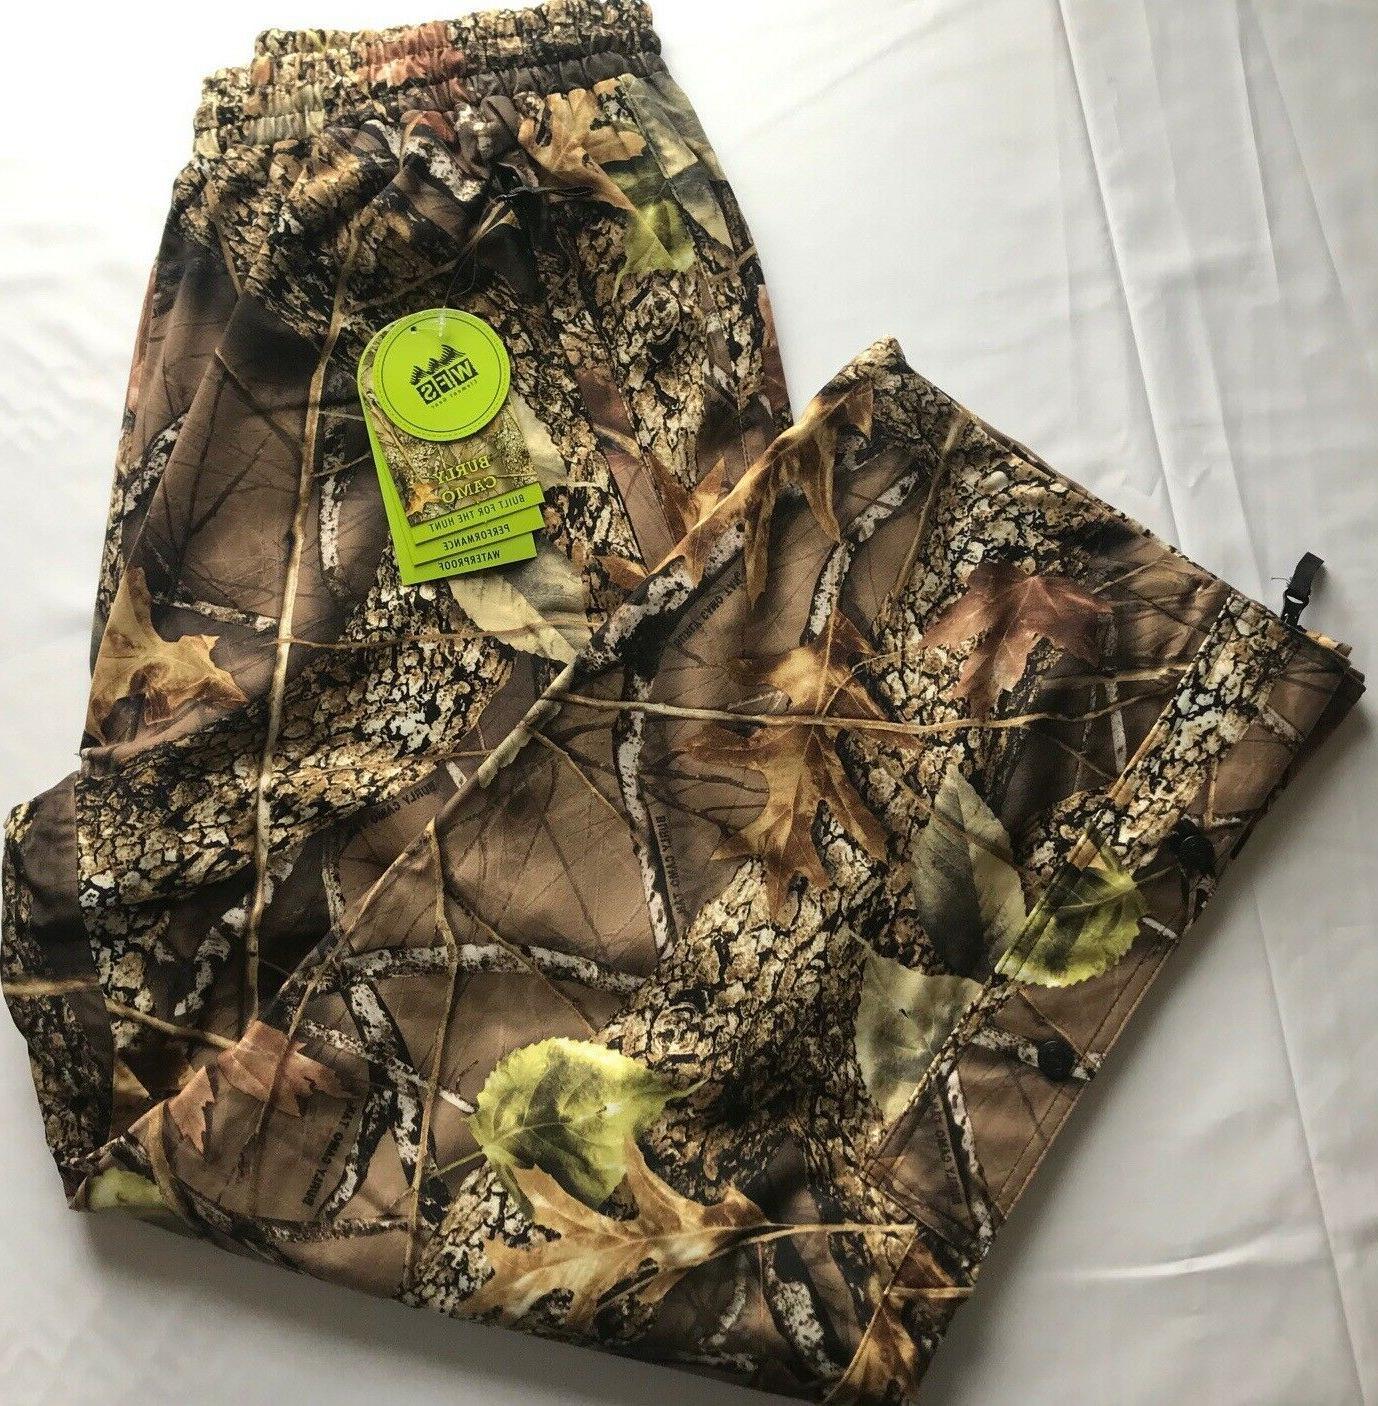 element gear burly camo waterproof pants hunting